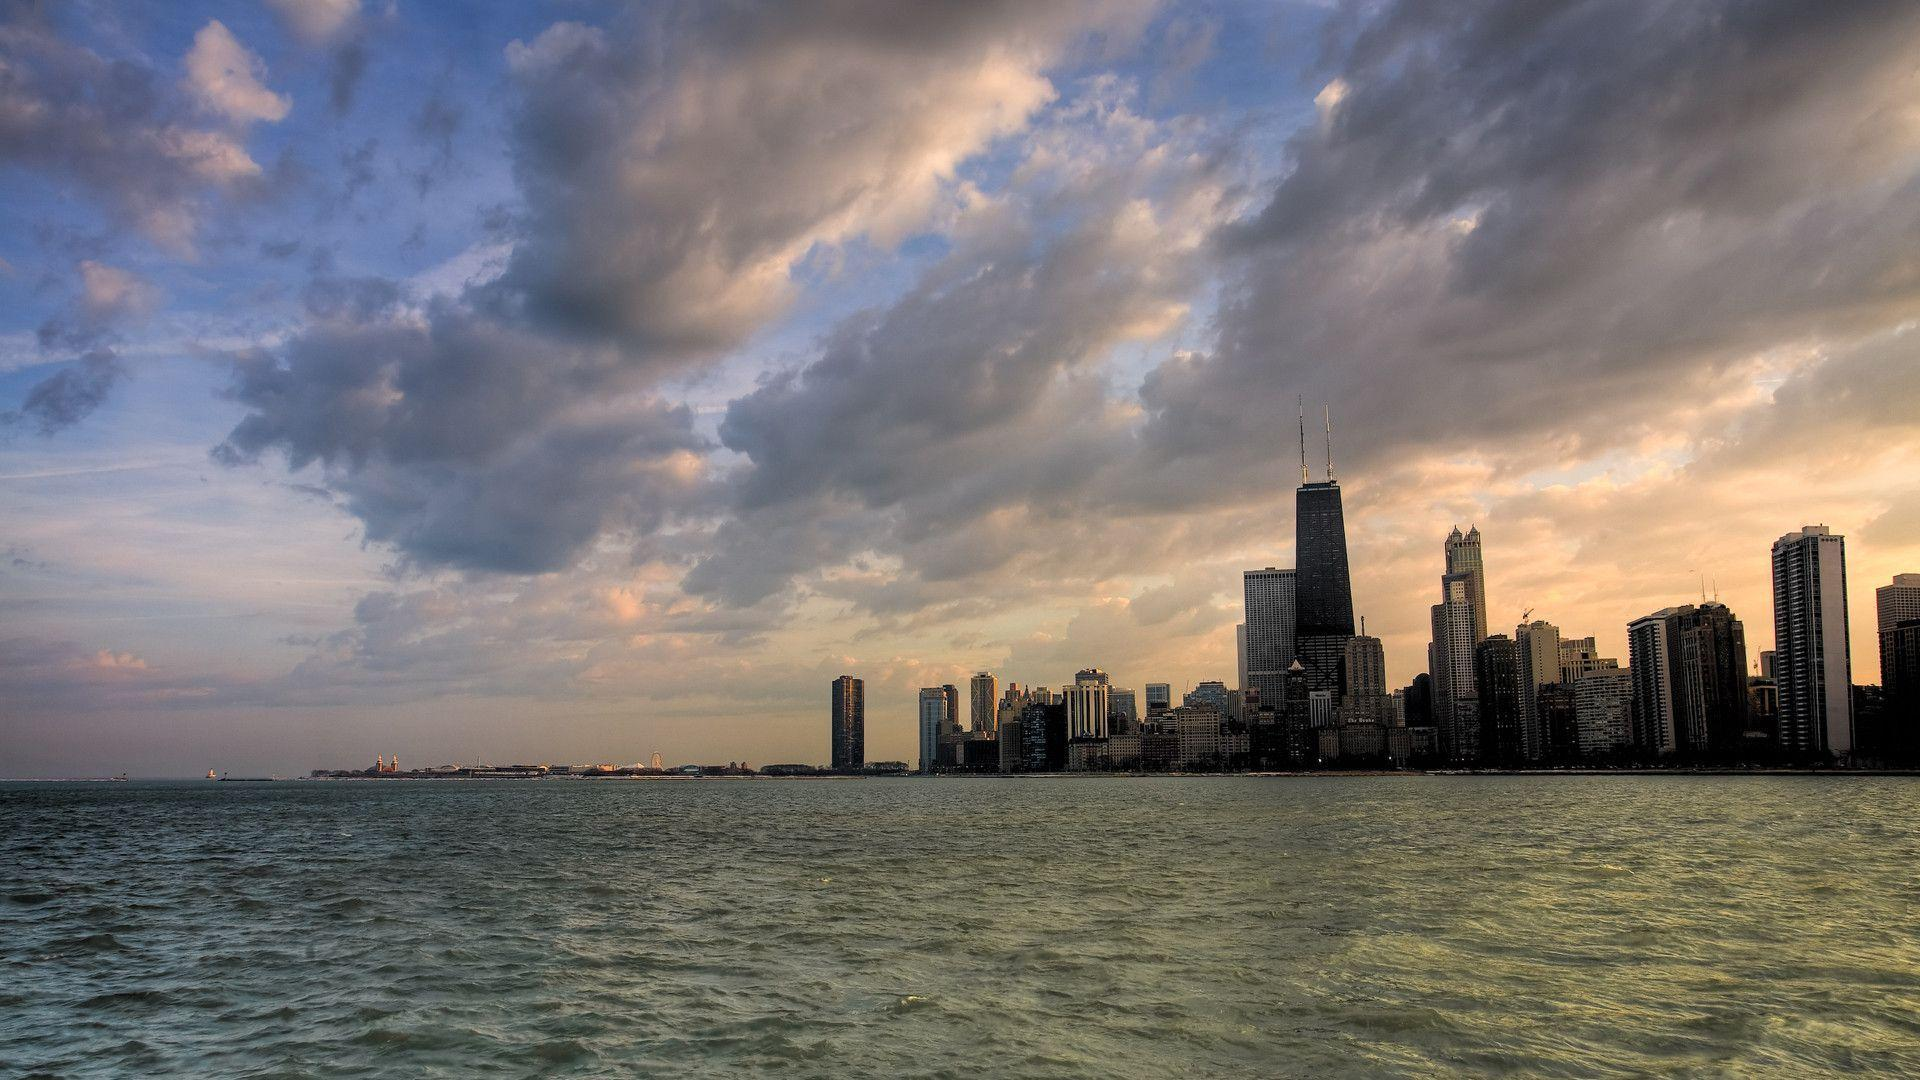 Chicago wallpaper - 76131